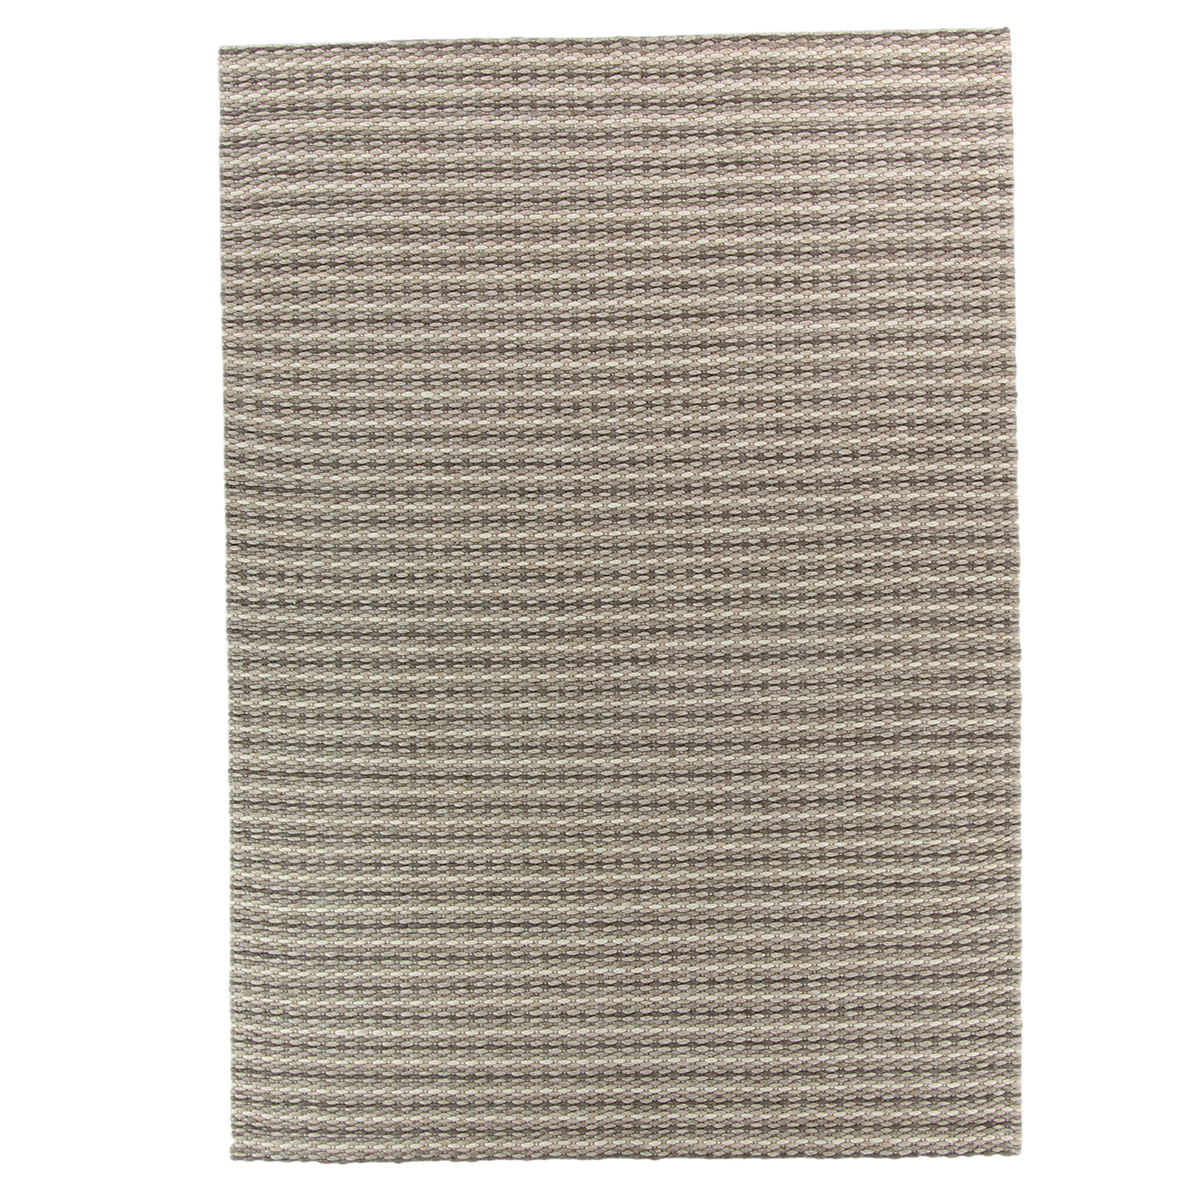 Vloerkleed Brinker Volt 02 | 160 x 230 cm